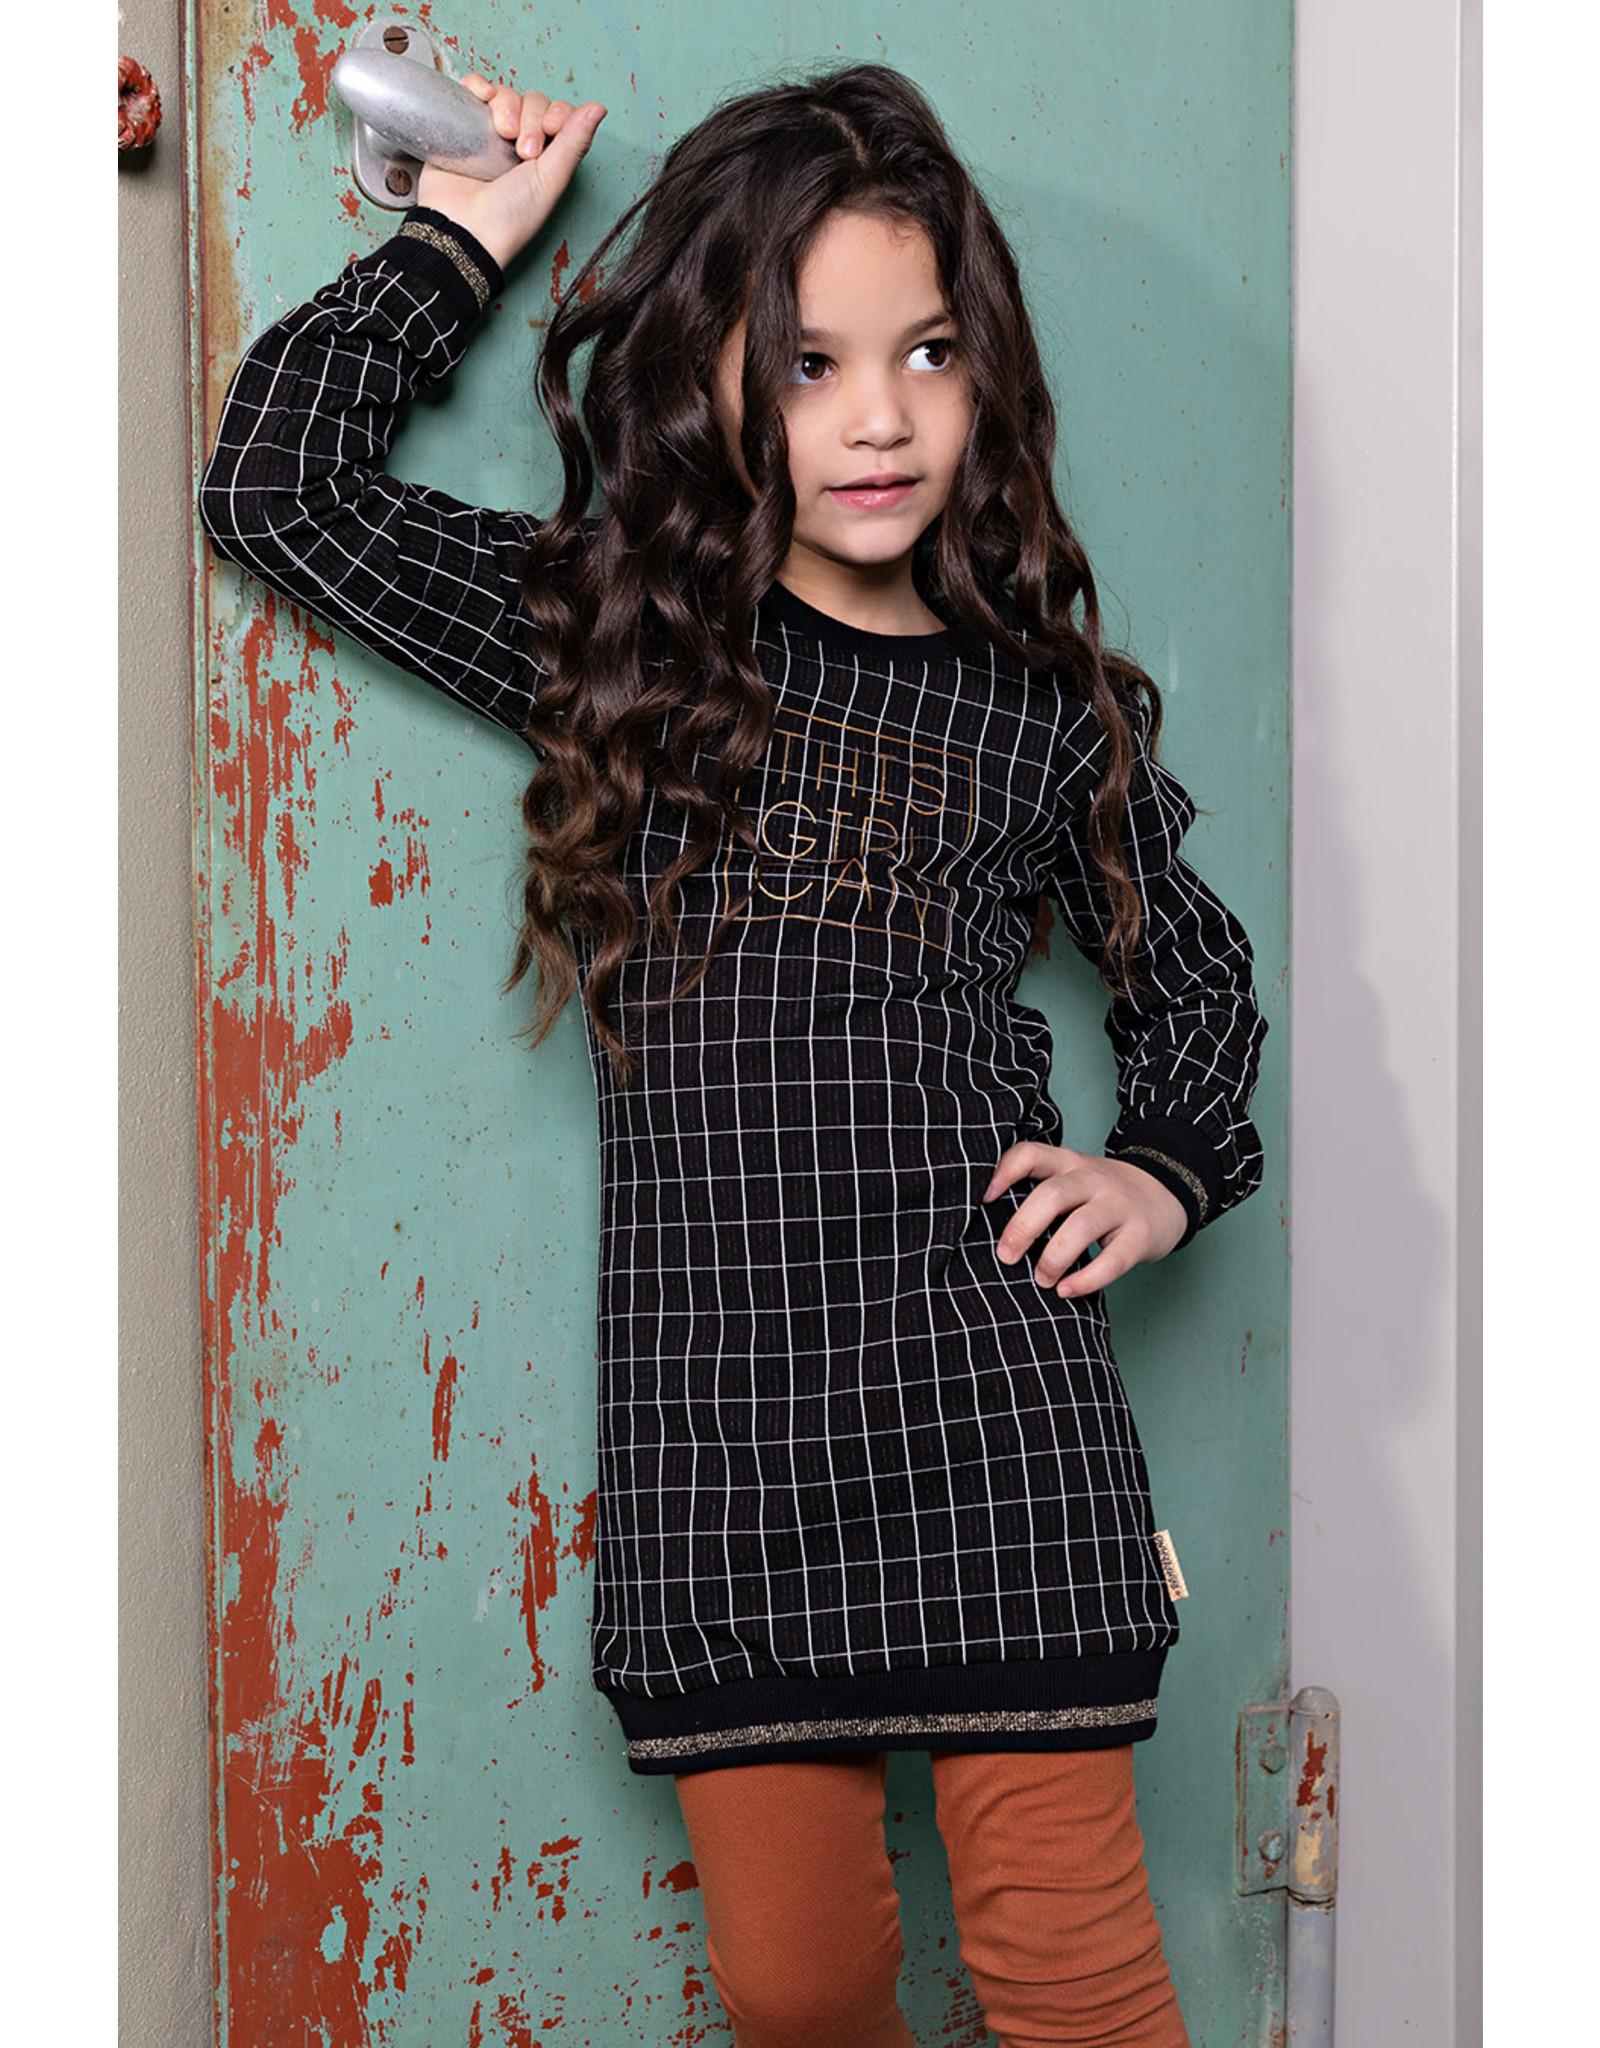 Bampidano Bampidano meisjes jurk Candice MON CHERI Black Check